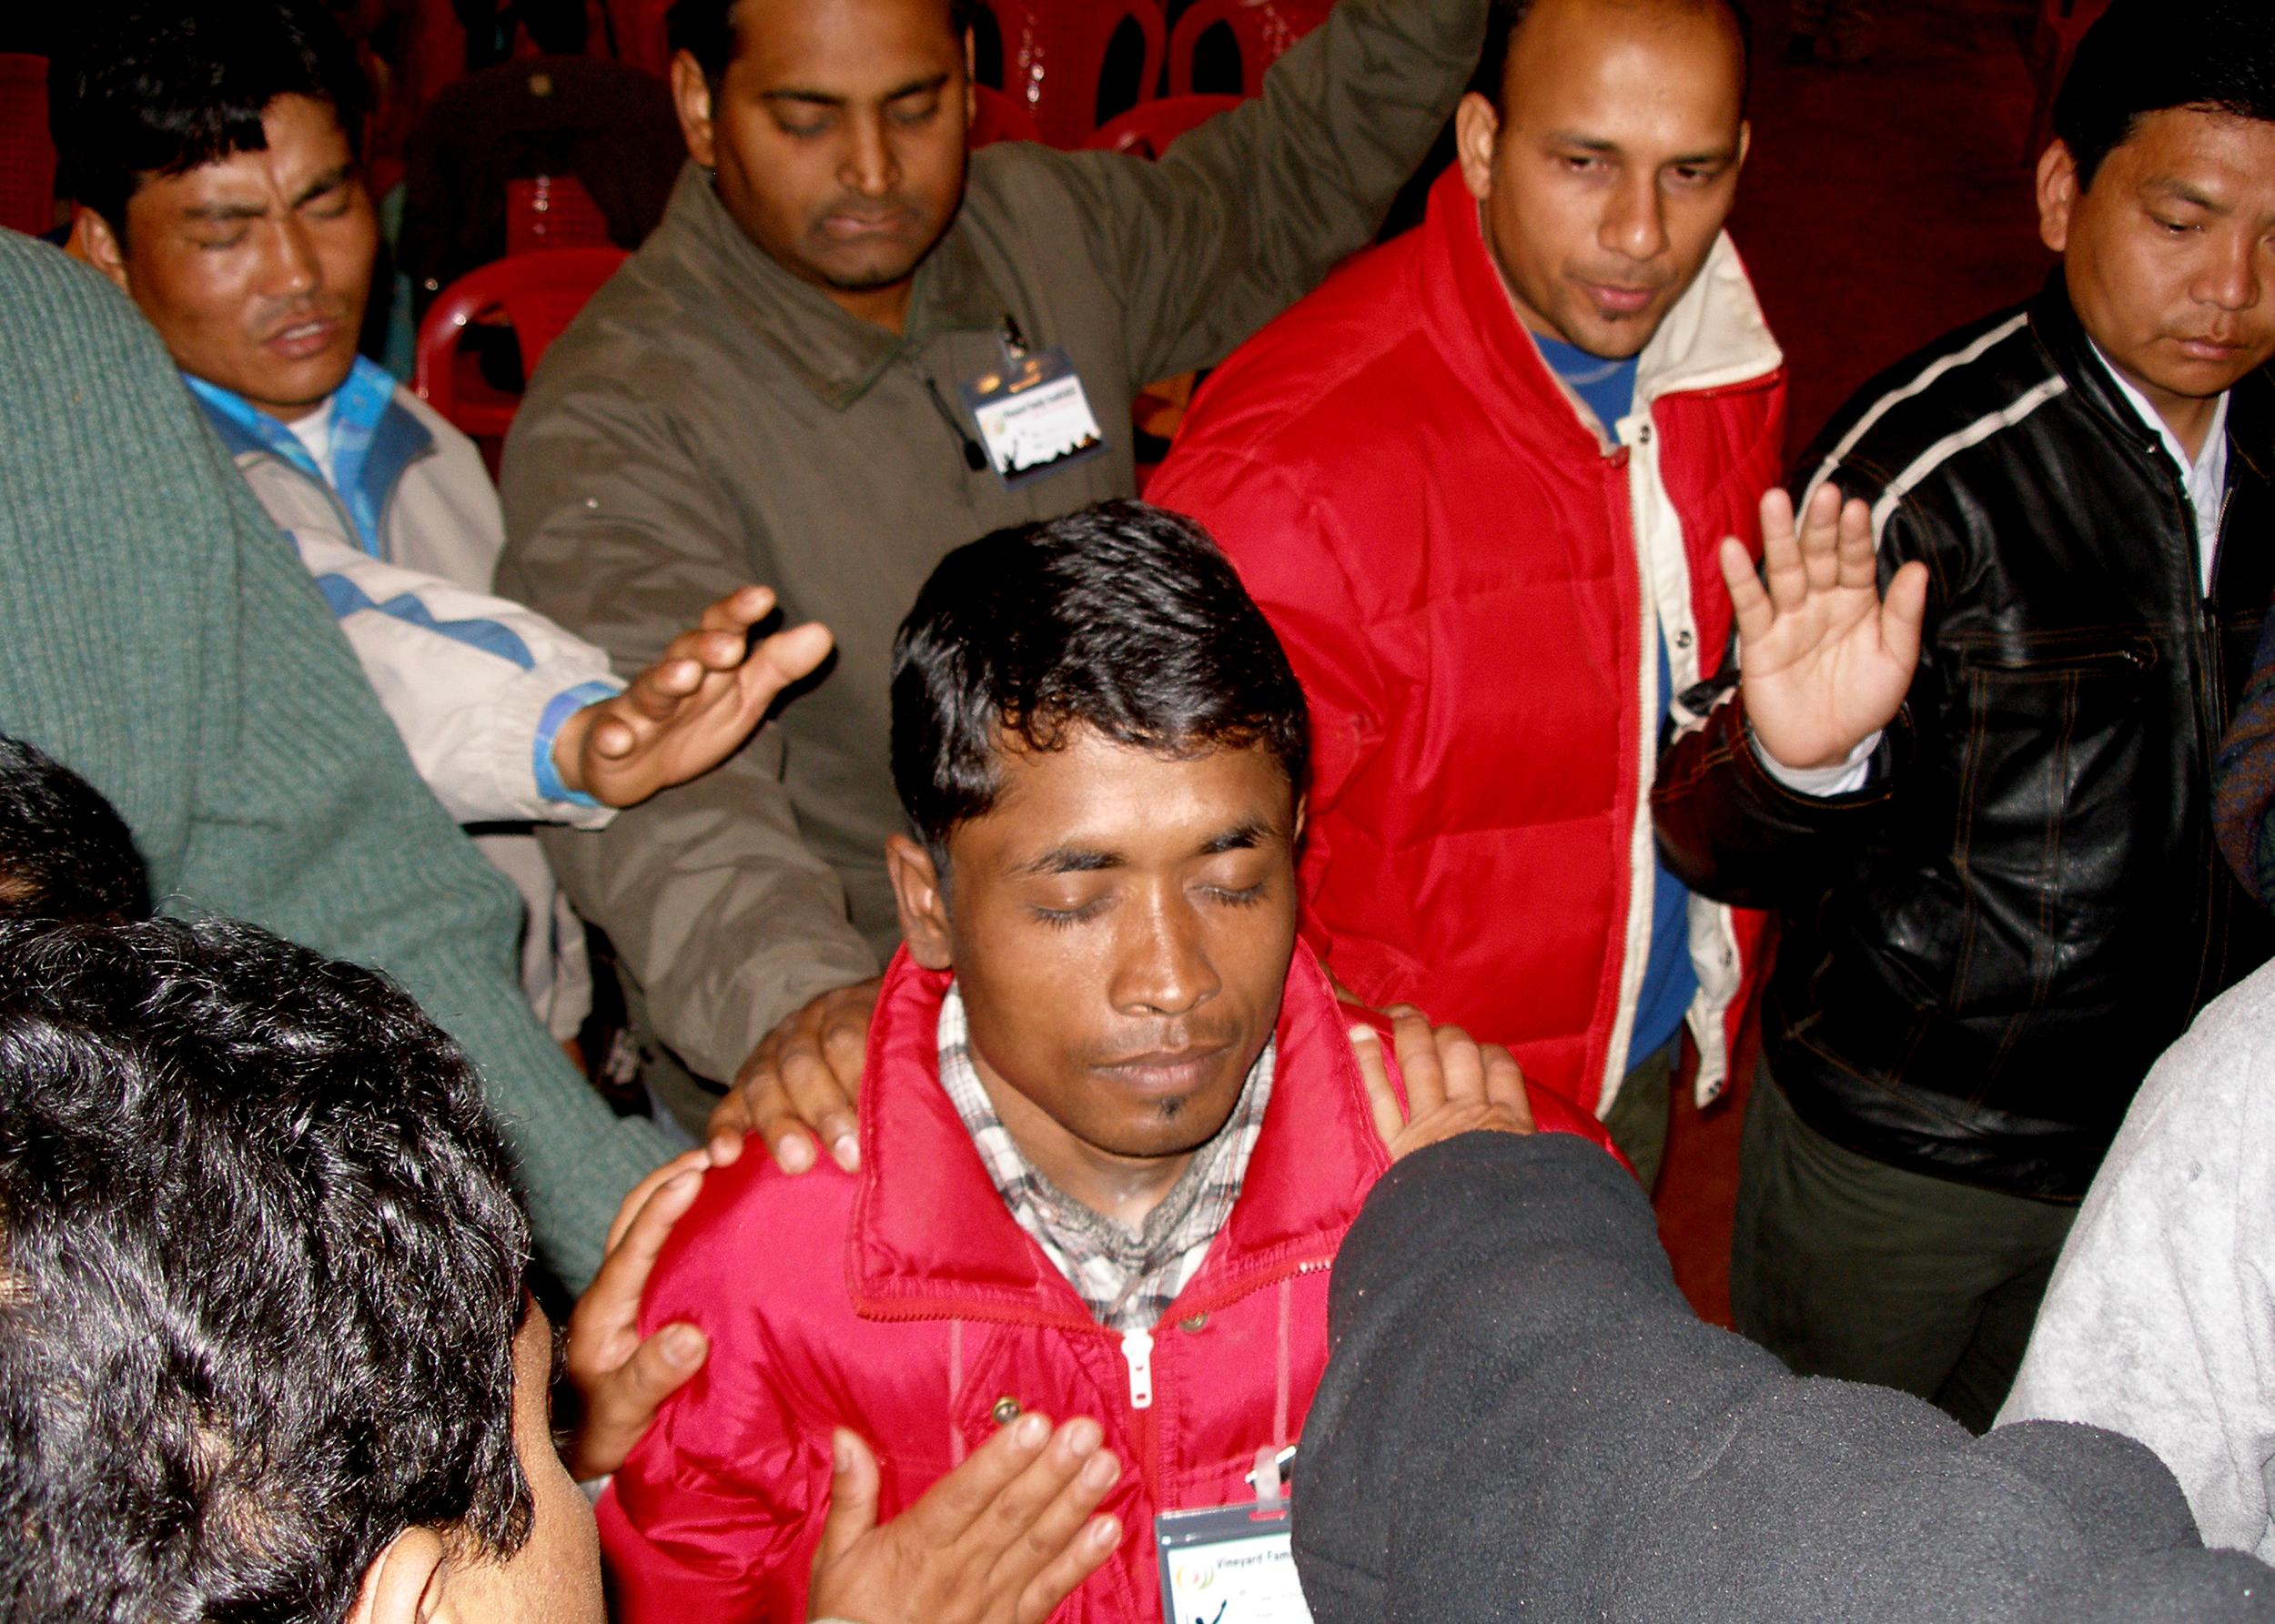 INDIA - Group praying over a man.jpg